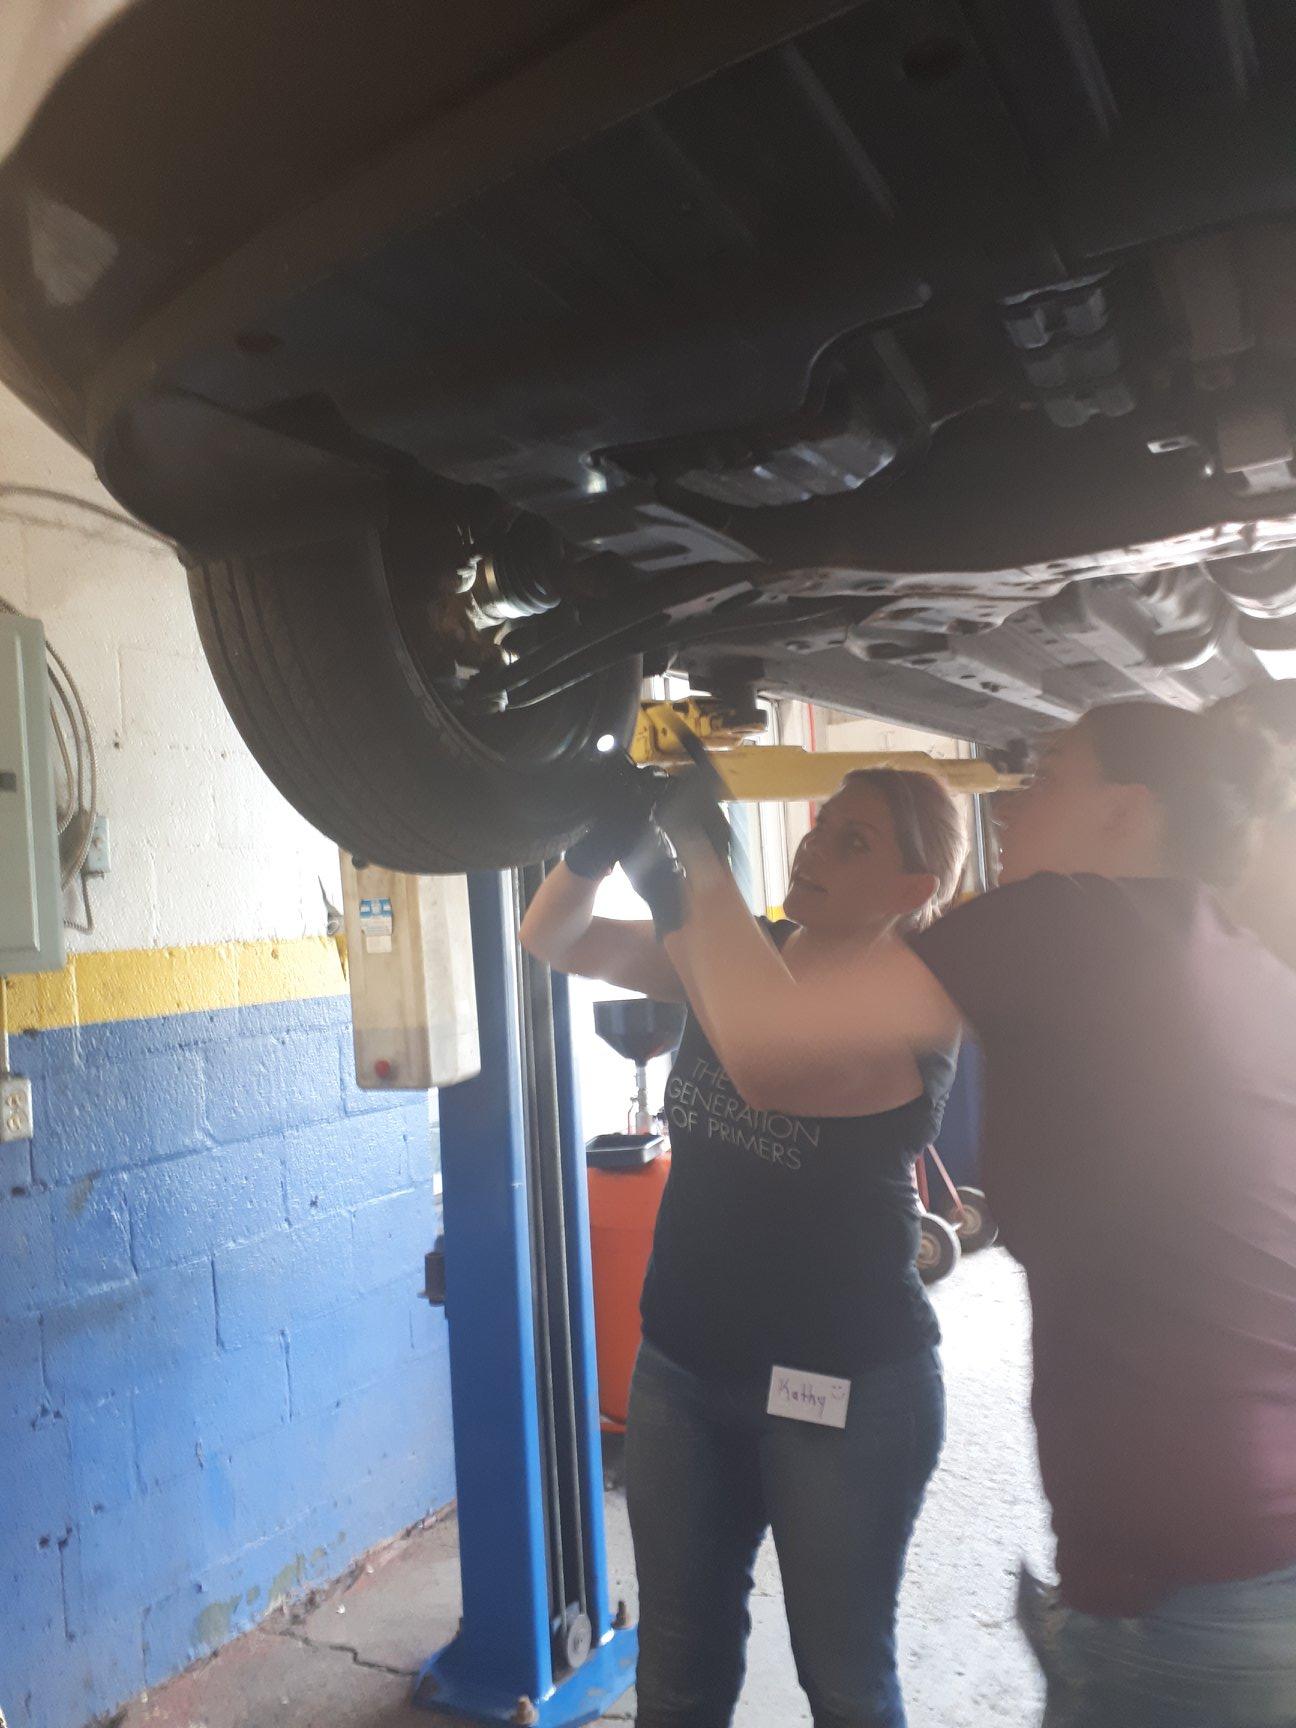 Two women working underneath a car